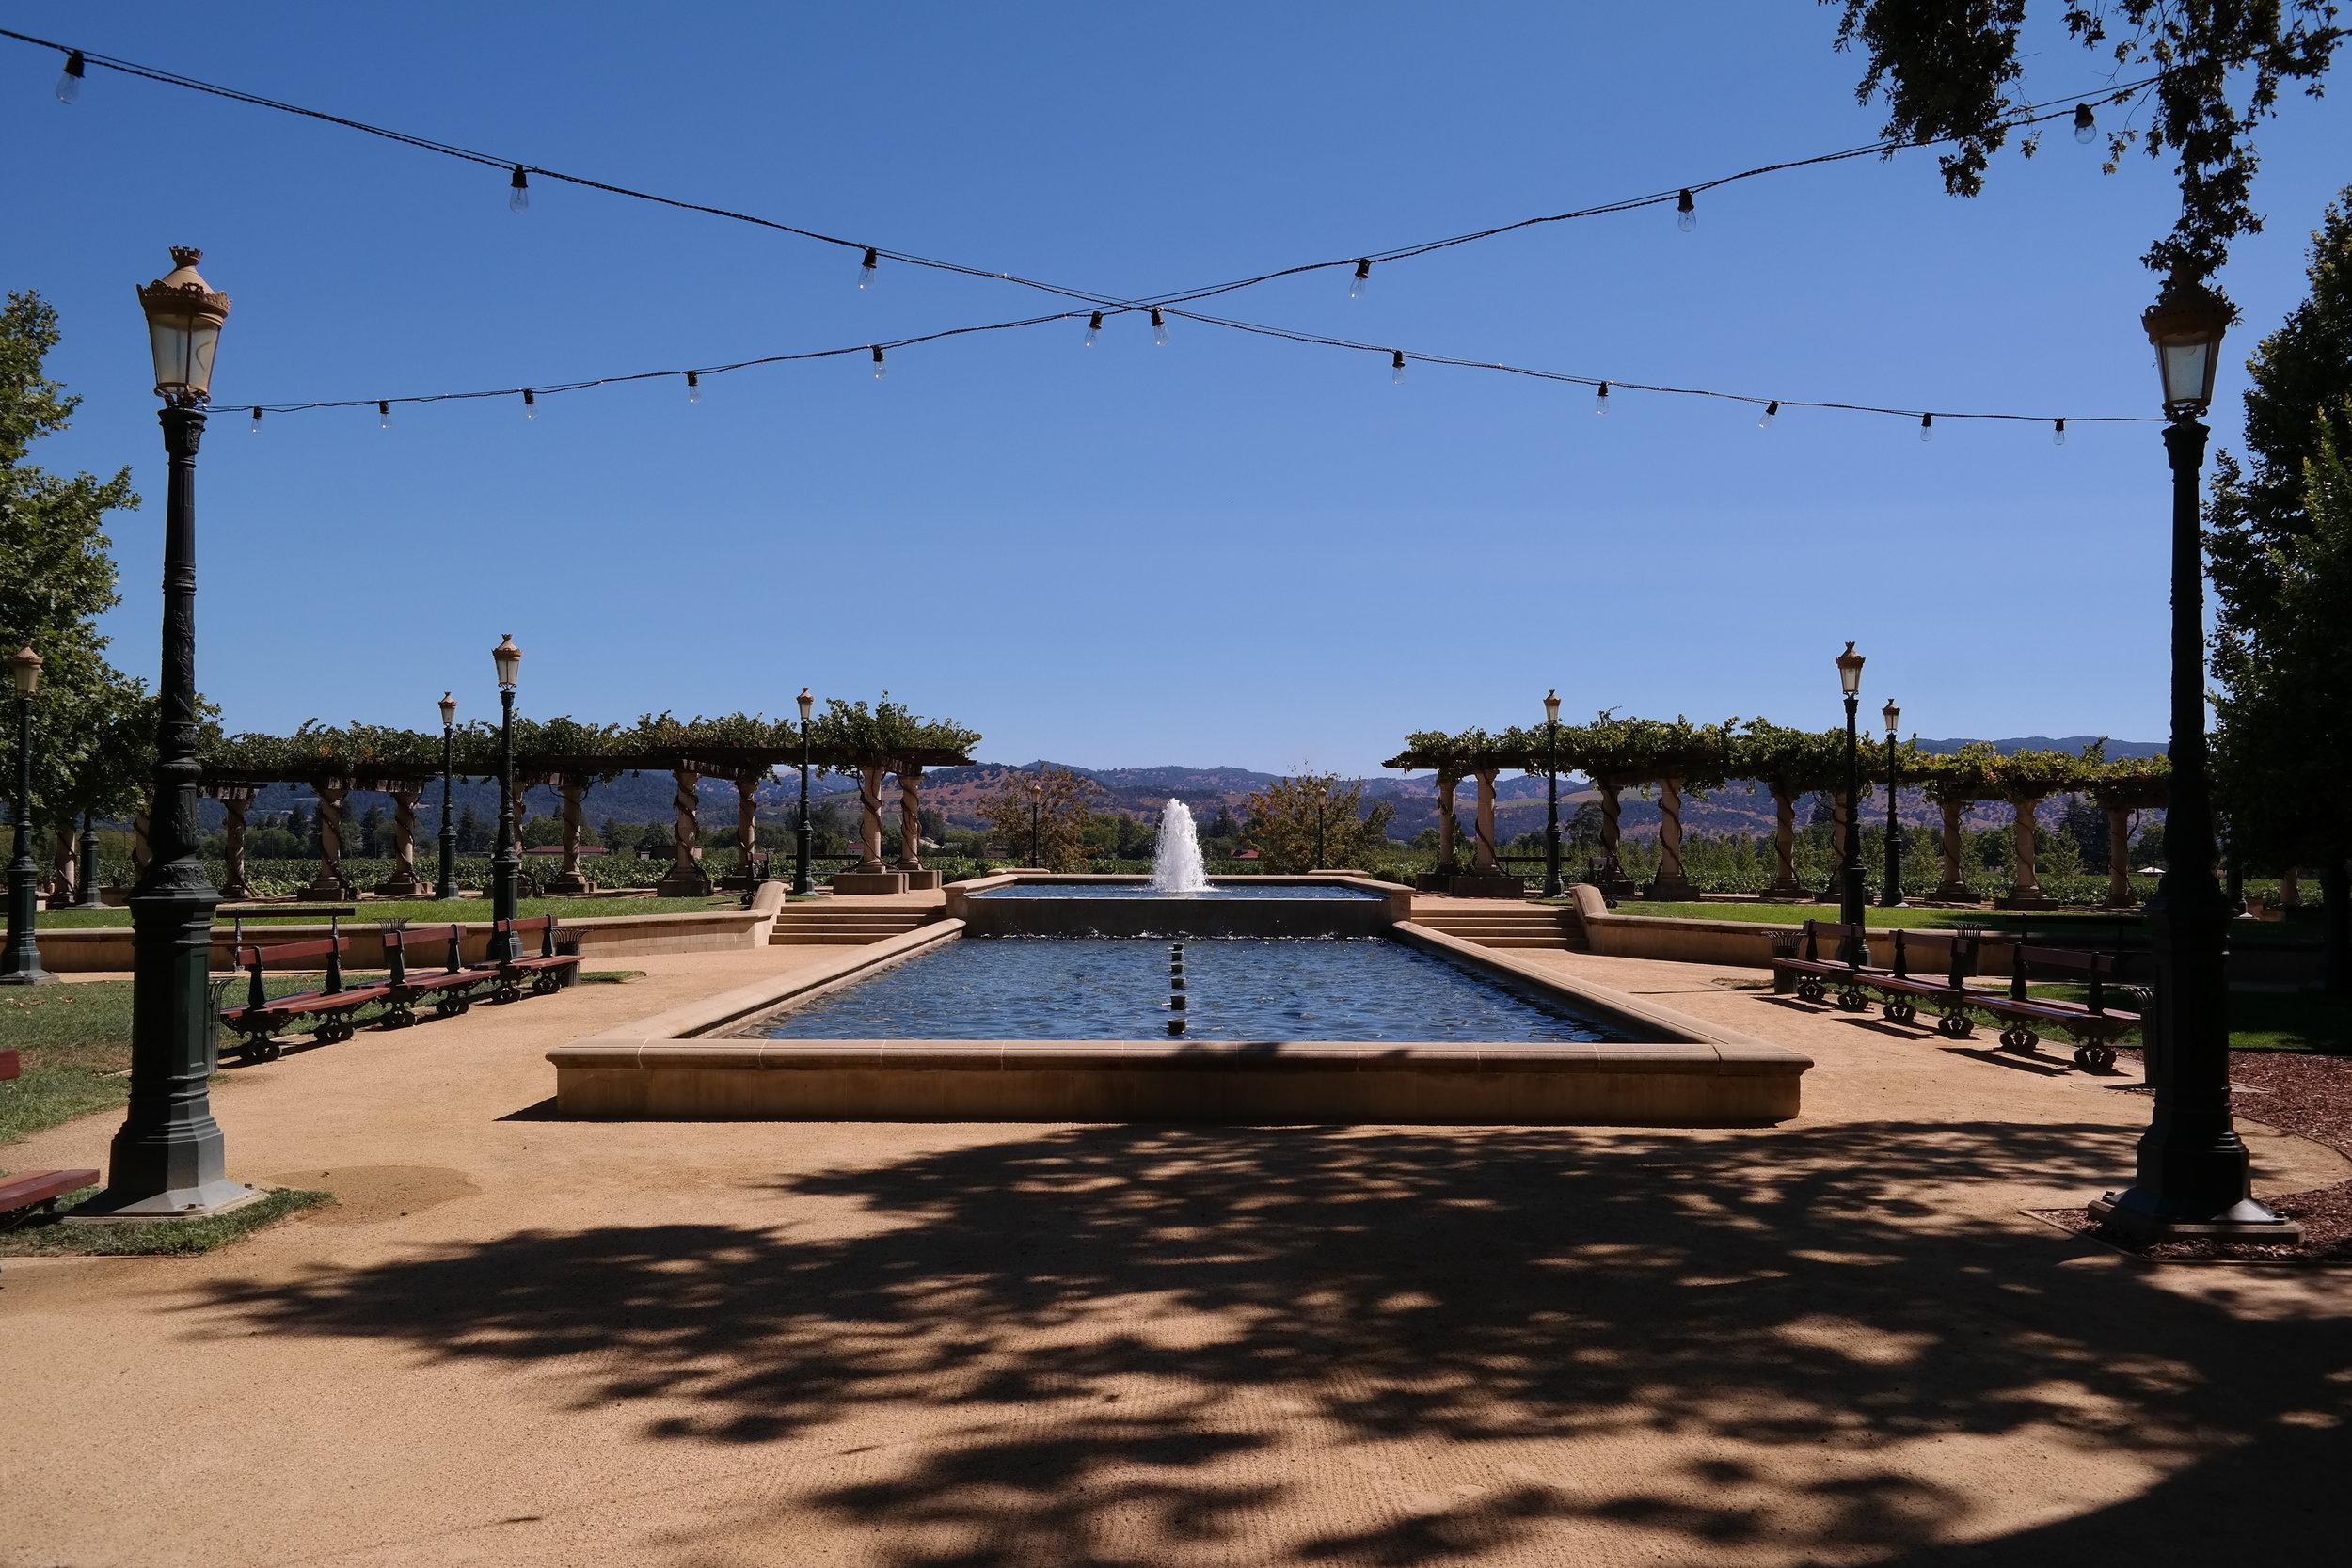 Inglenook Francis Coppola's vineyard